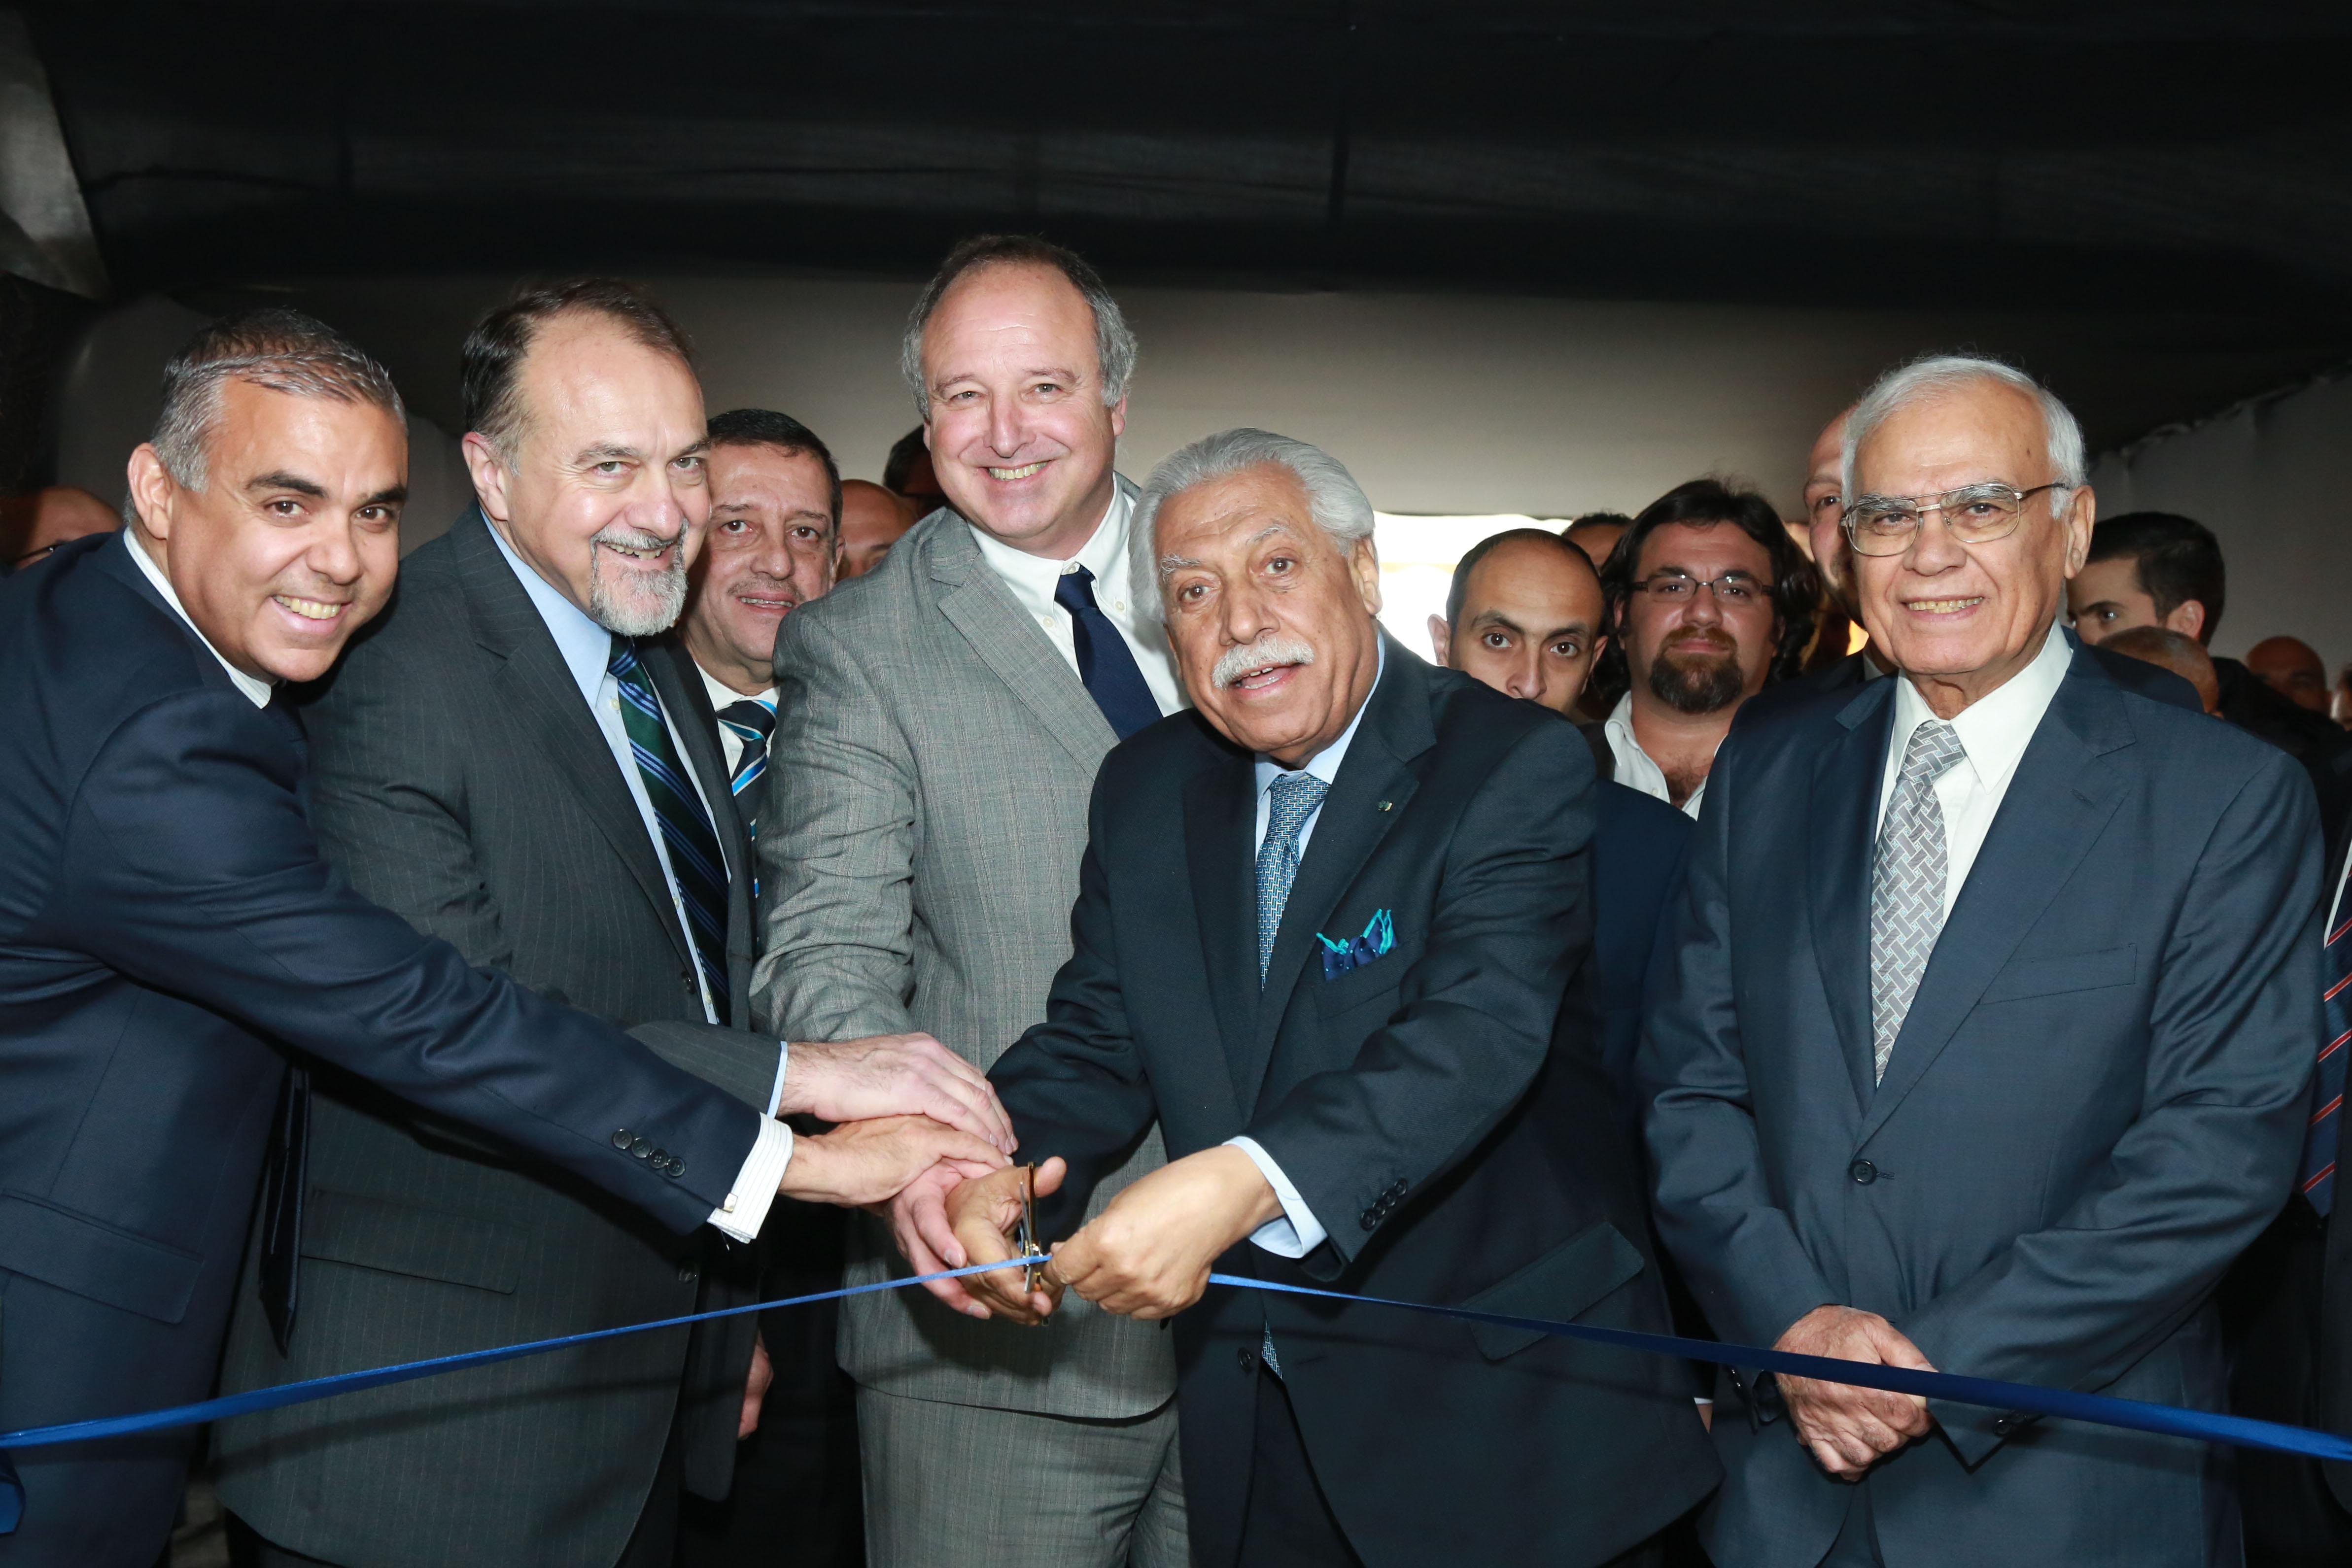 Jordan's Exclusive GM Dealer Inaugurates All-New Service